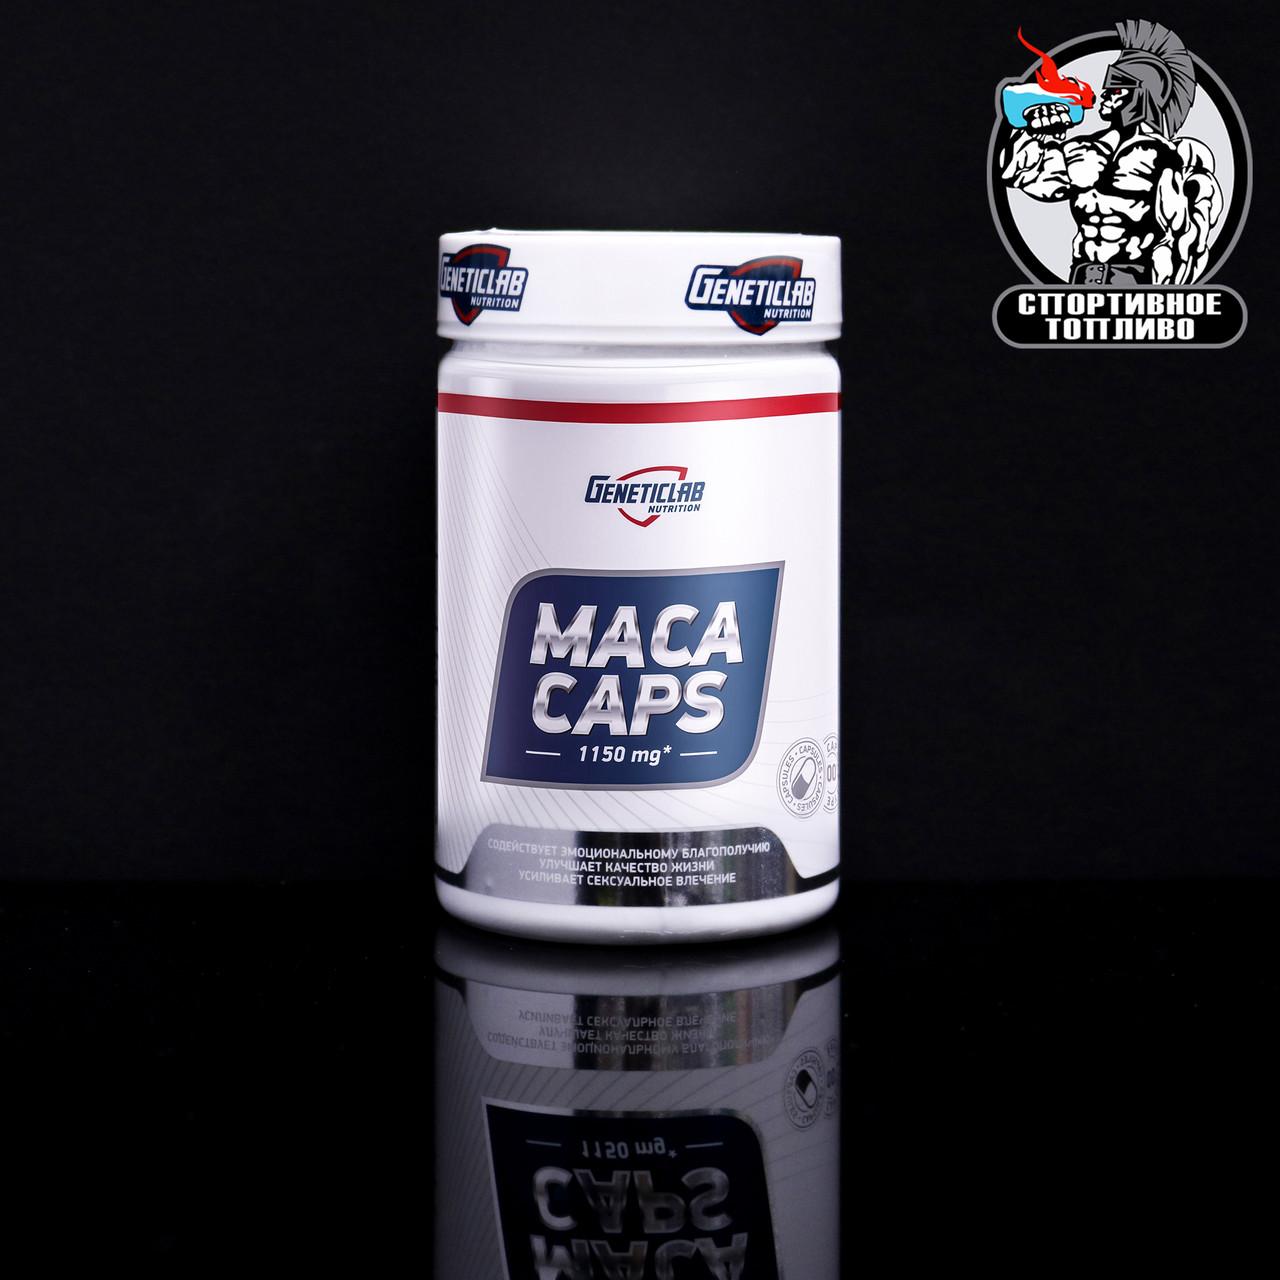 GeneticLab - Maca caps 60капс/60порций